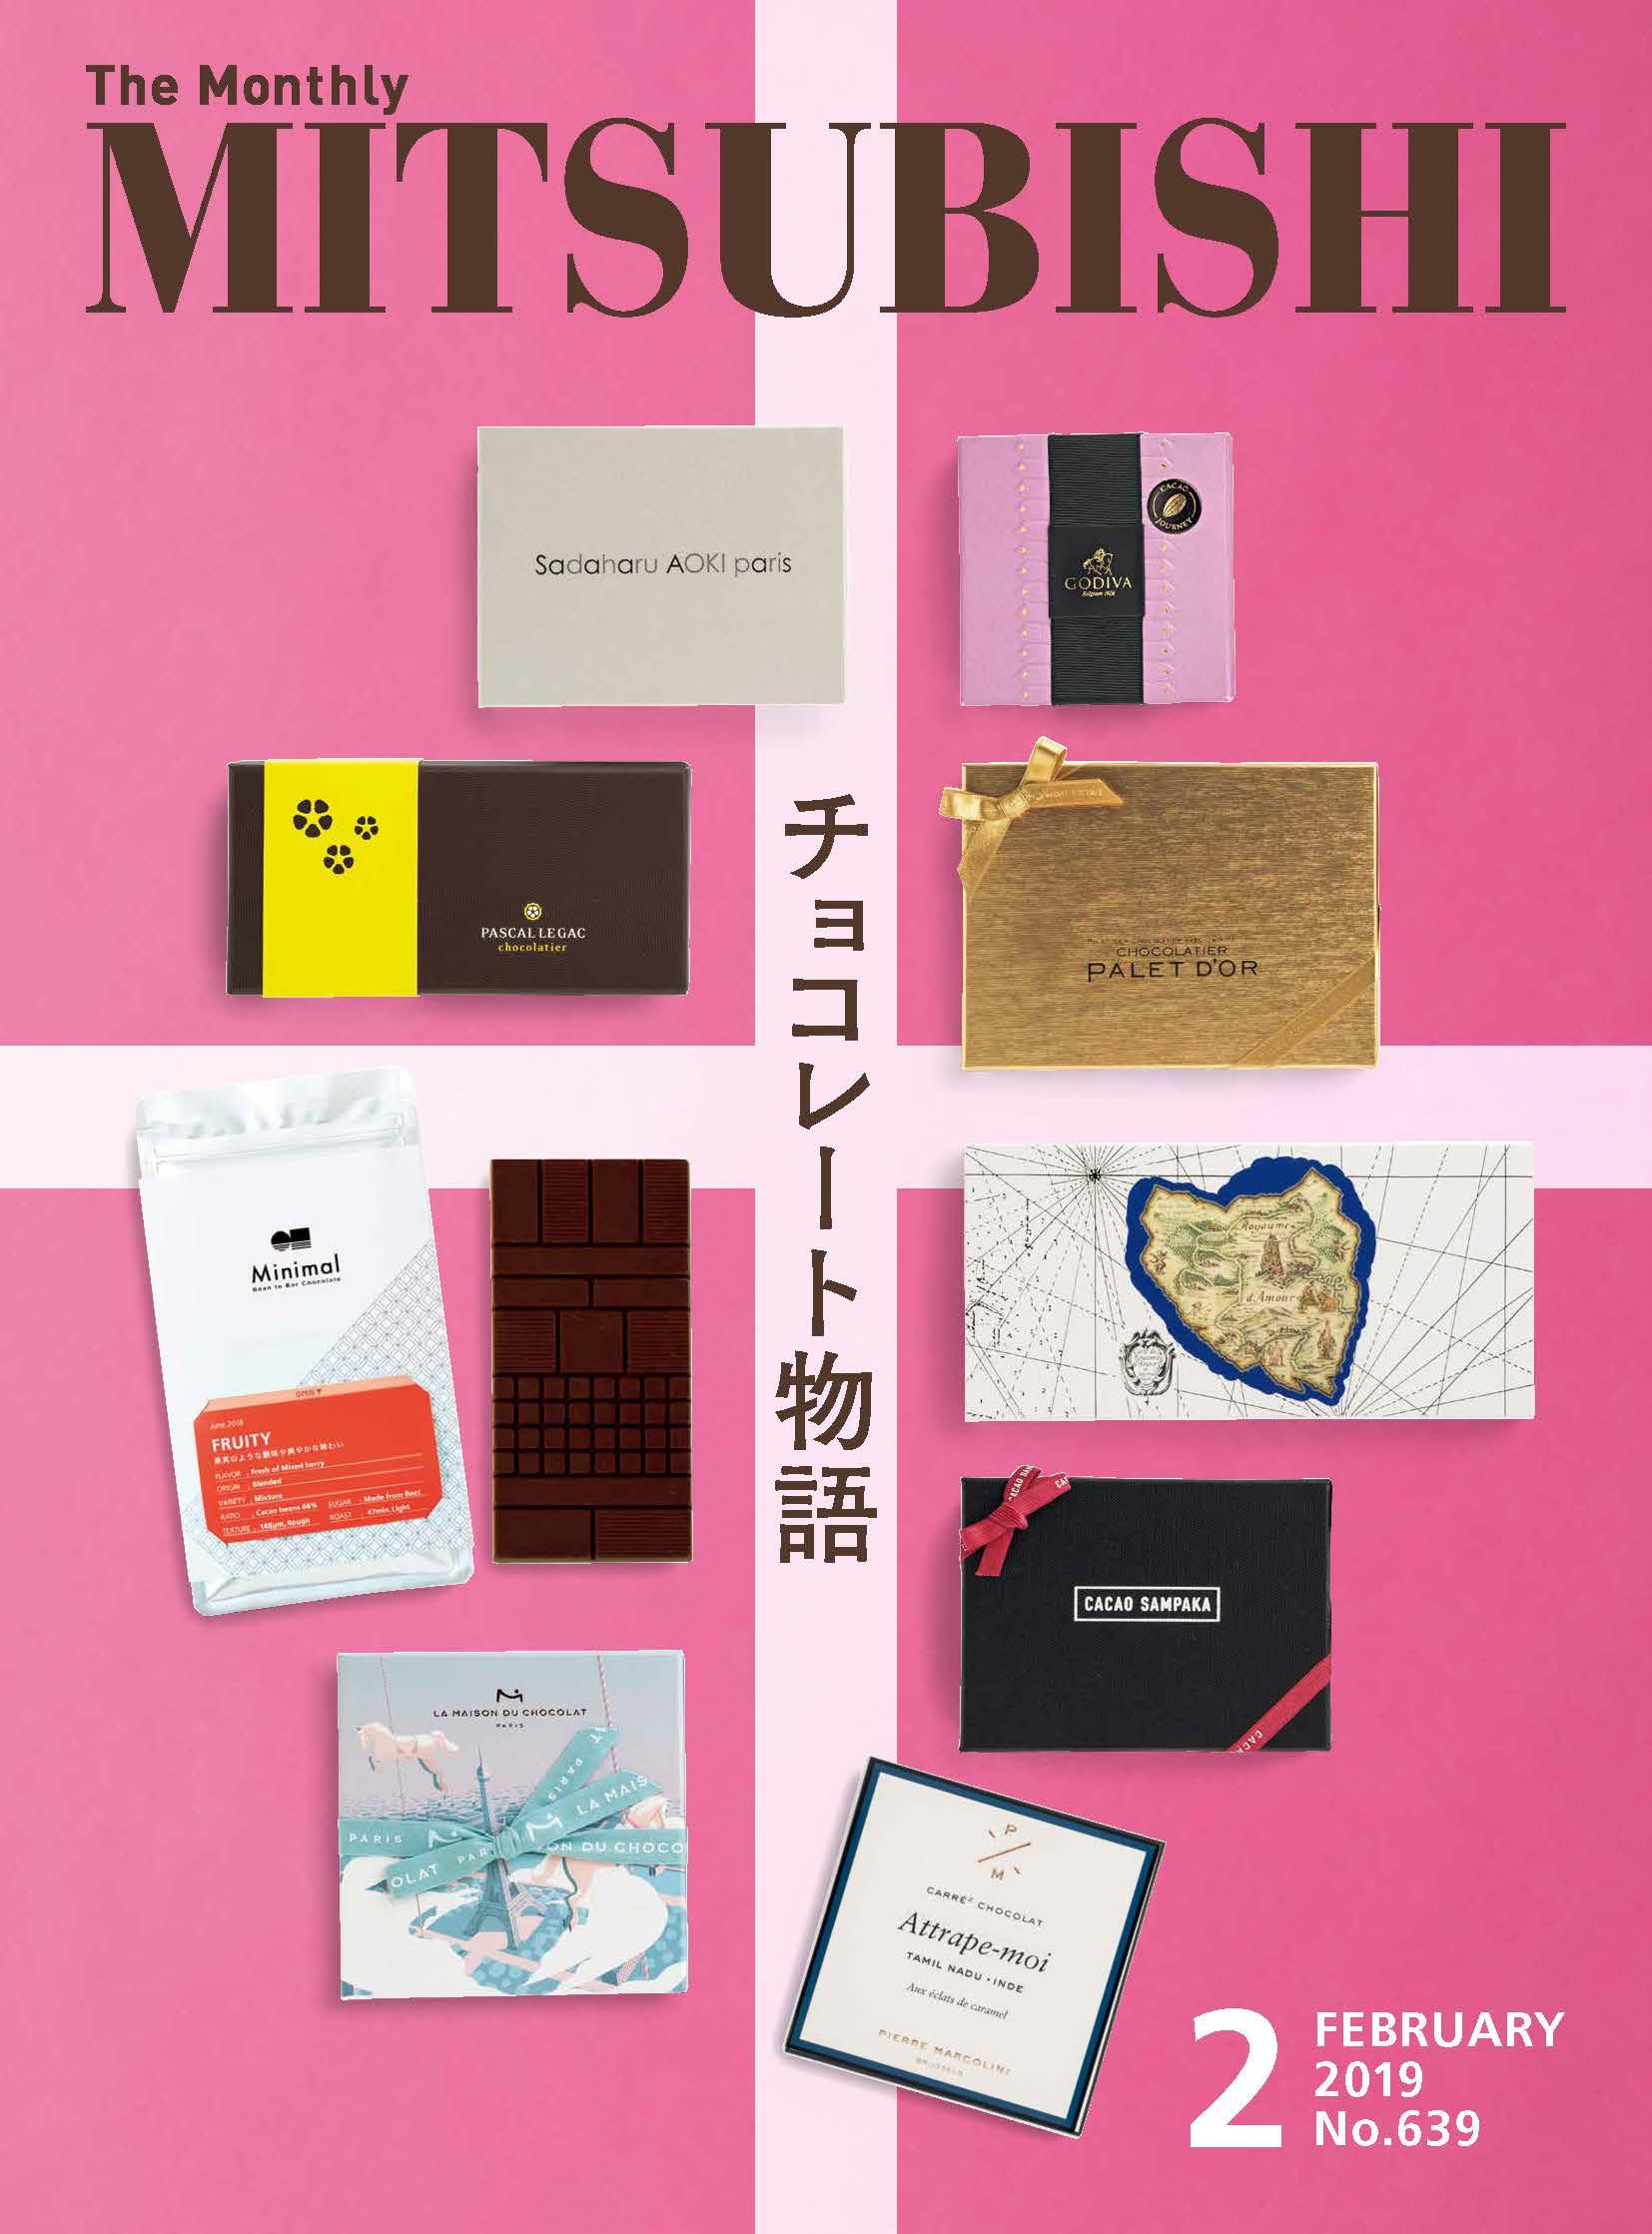 THE MONTHLY MITSUBISHI